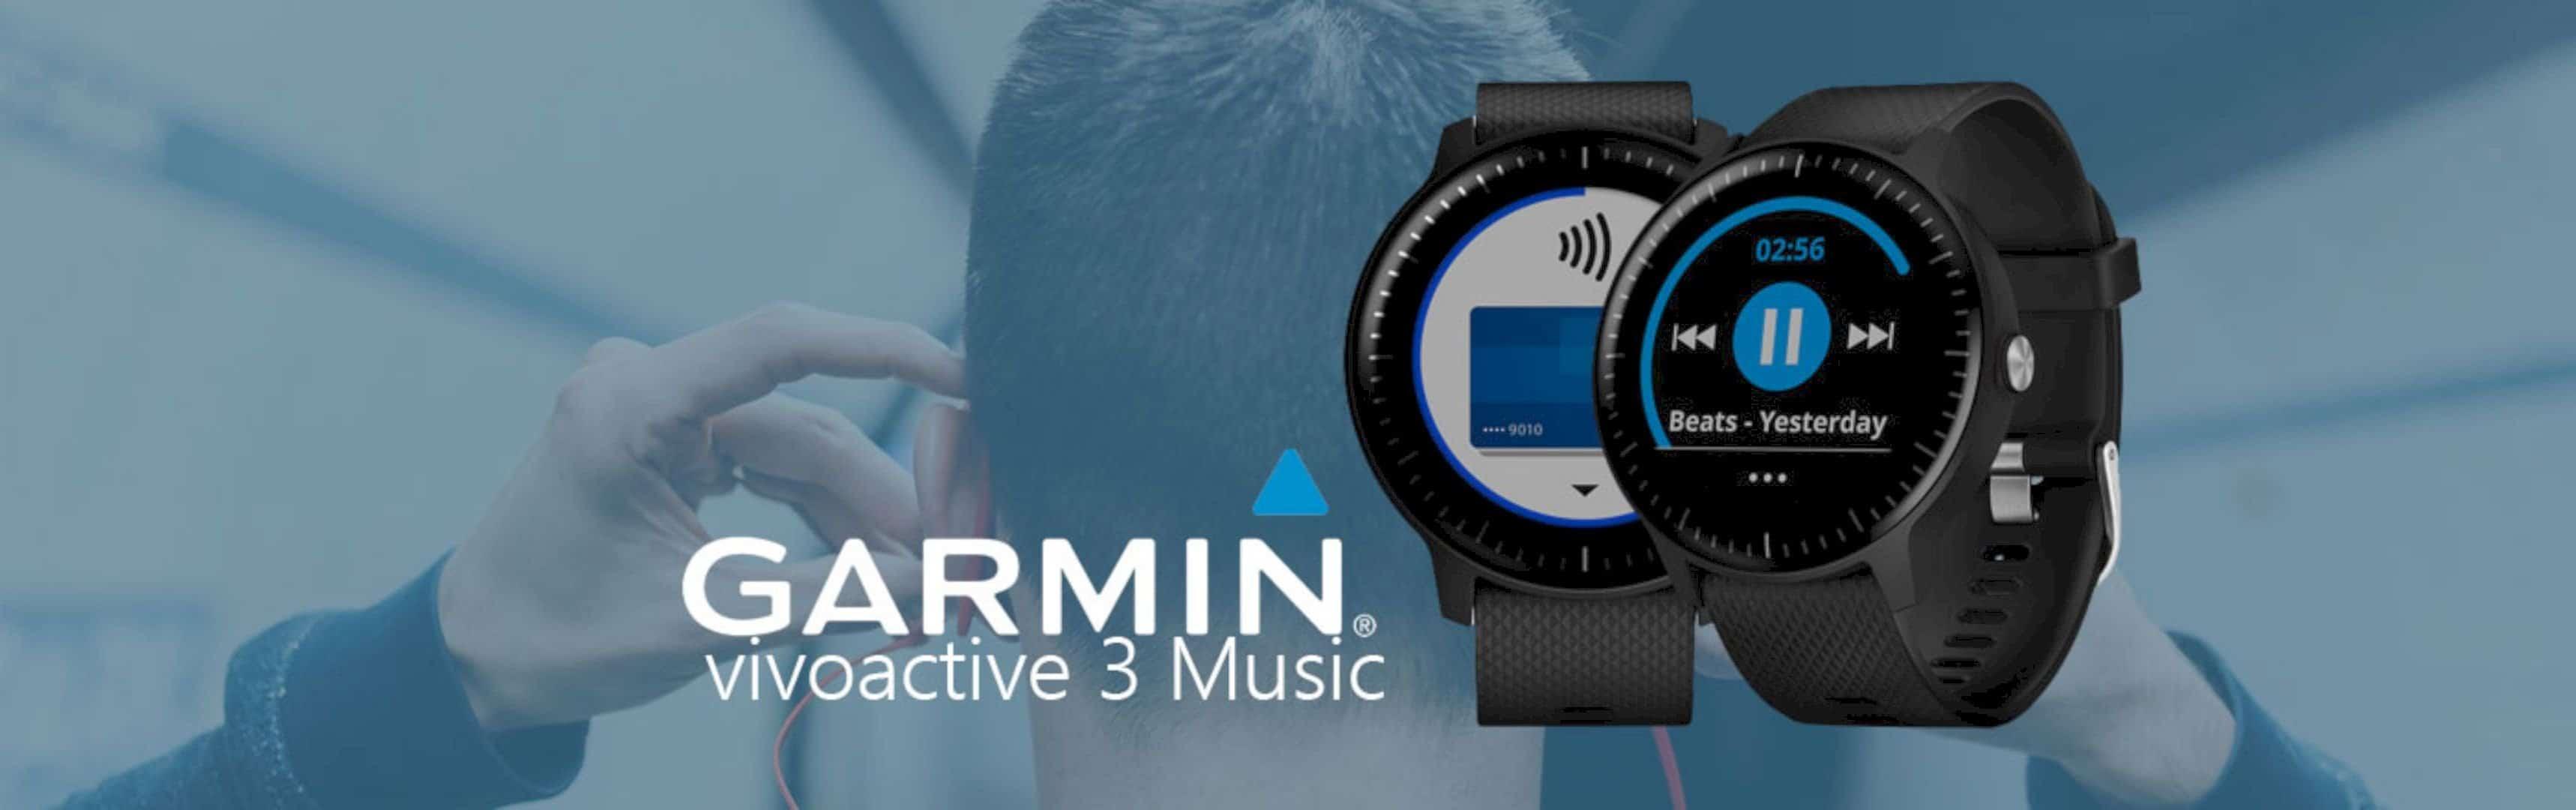 Garmin vívoactive® 3 Music: Your Watch, Your Music, Your Choice